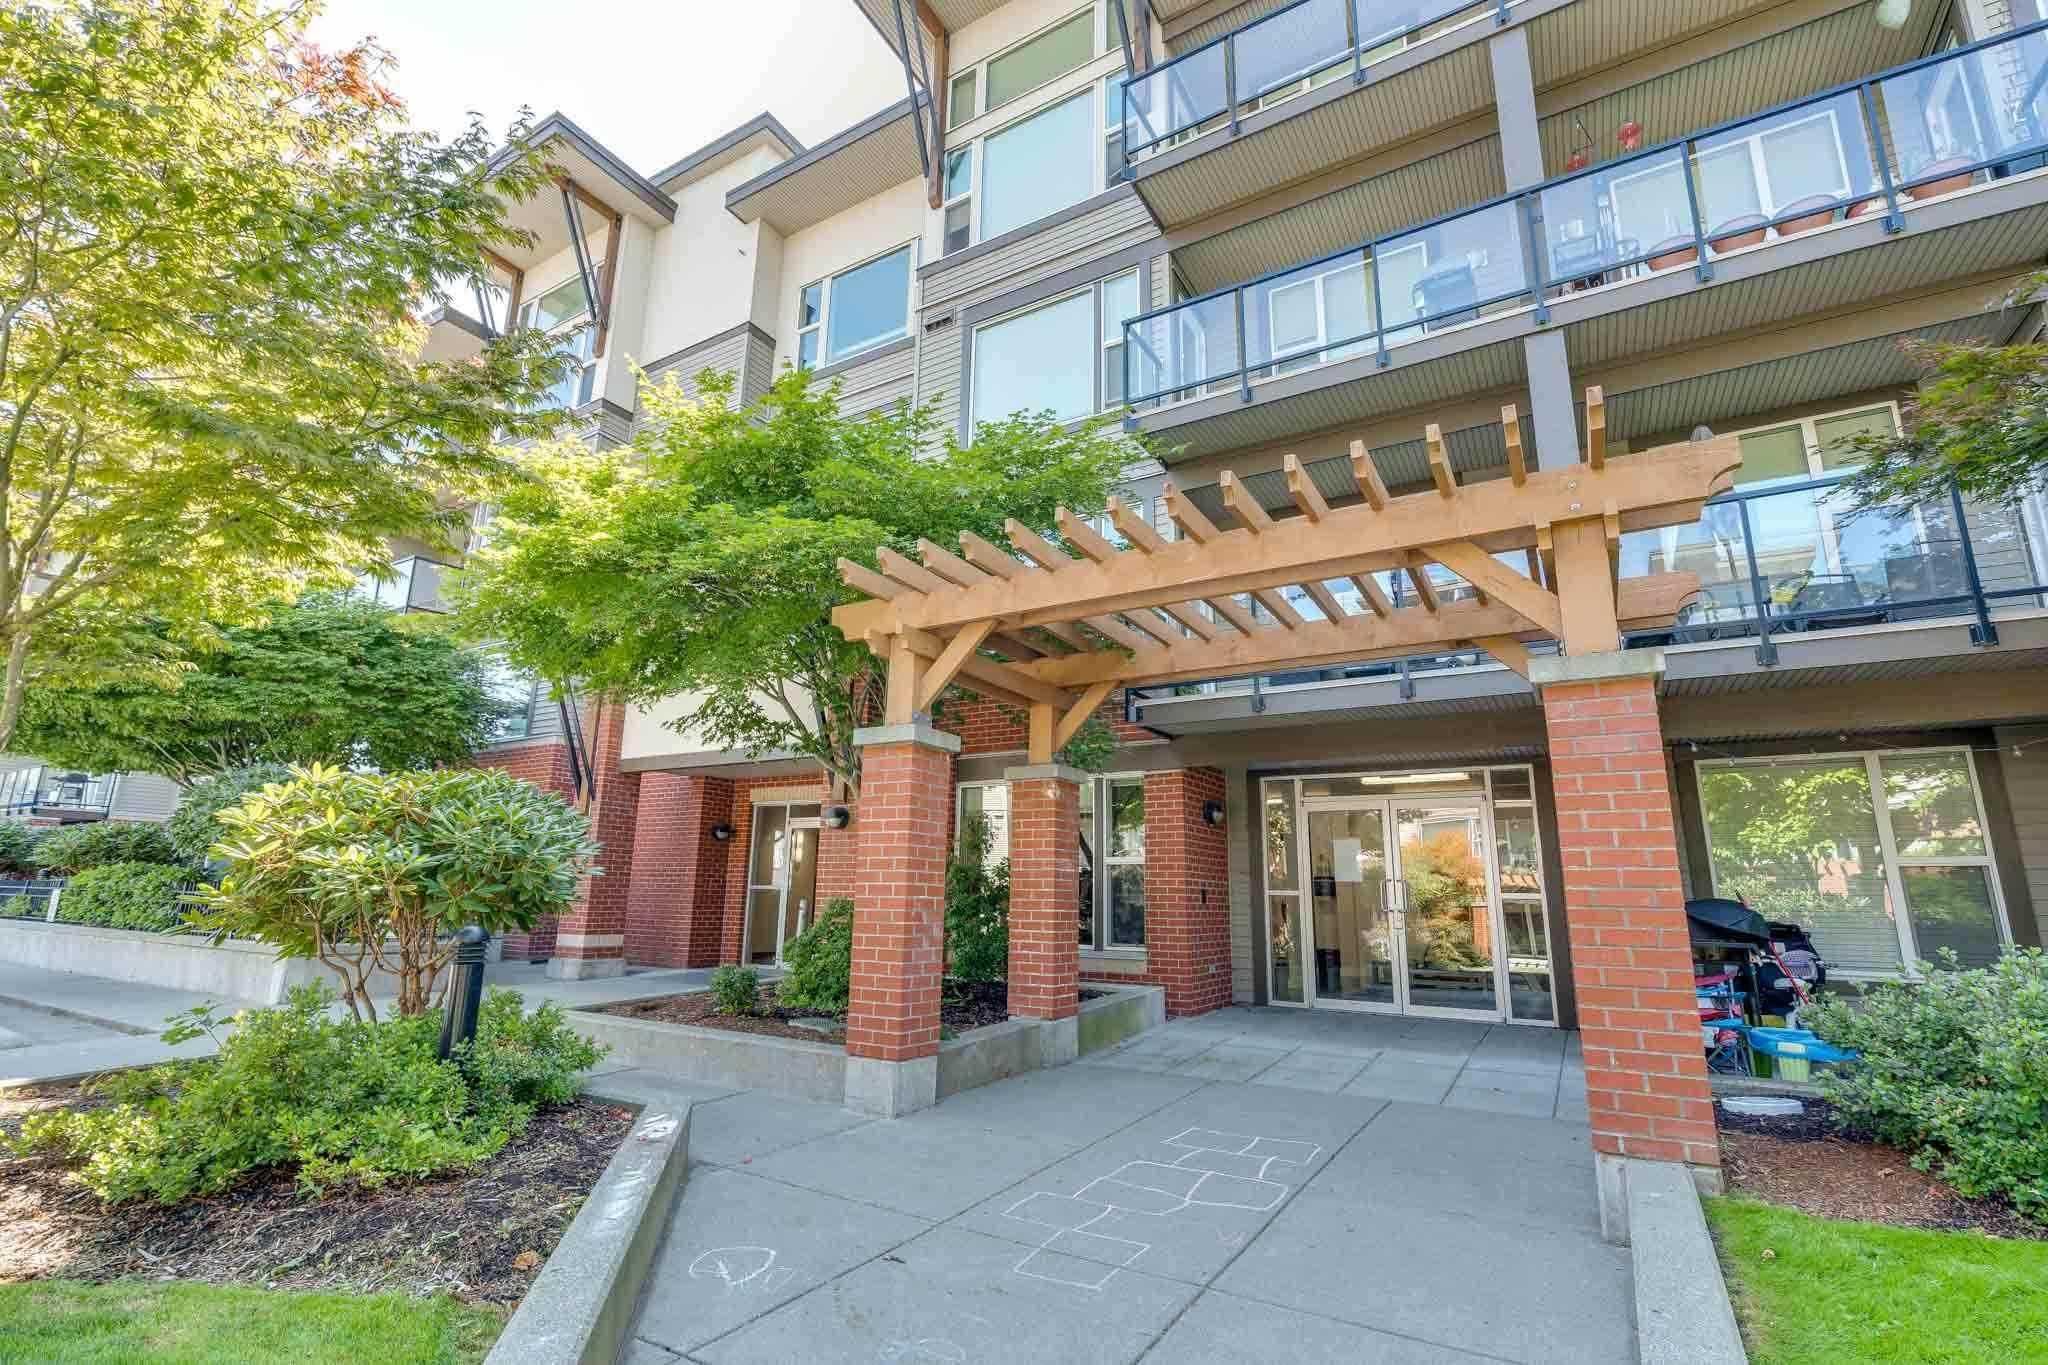 412 33539 HOLLAND AVENUE - Central Abbotsford Apartment/Condo for sale, 1 Bedroom (R2605185) - #1